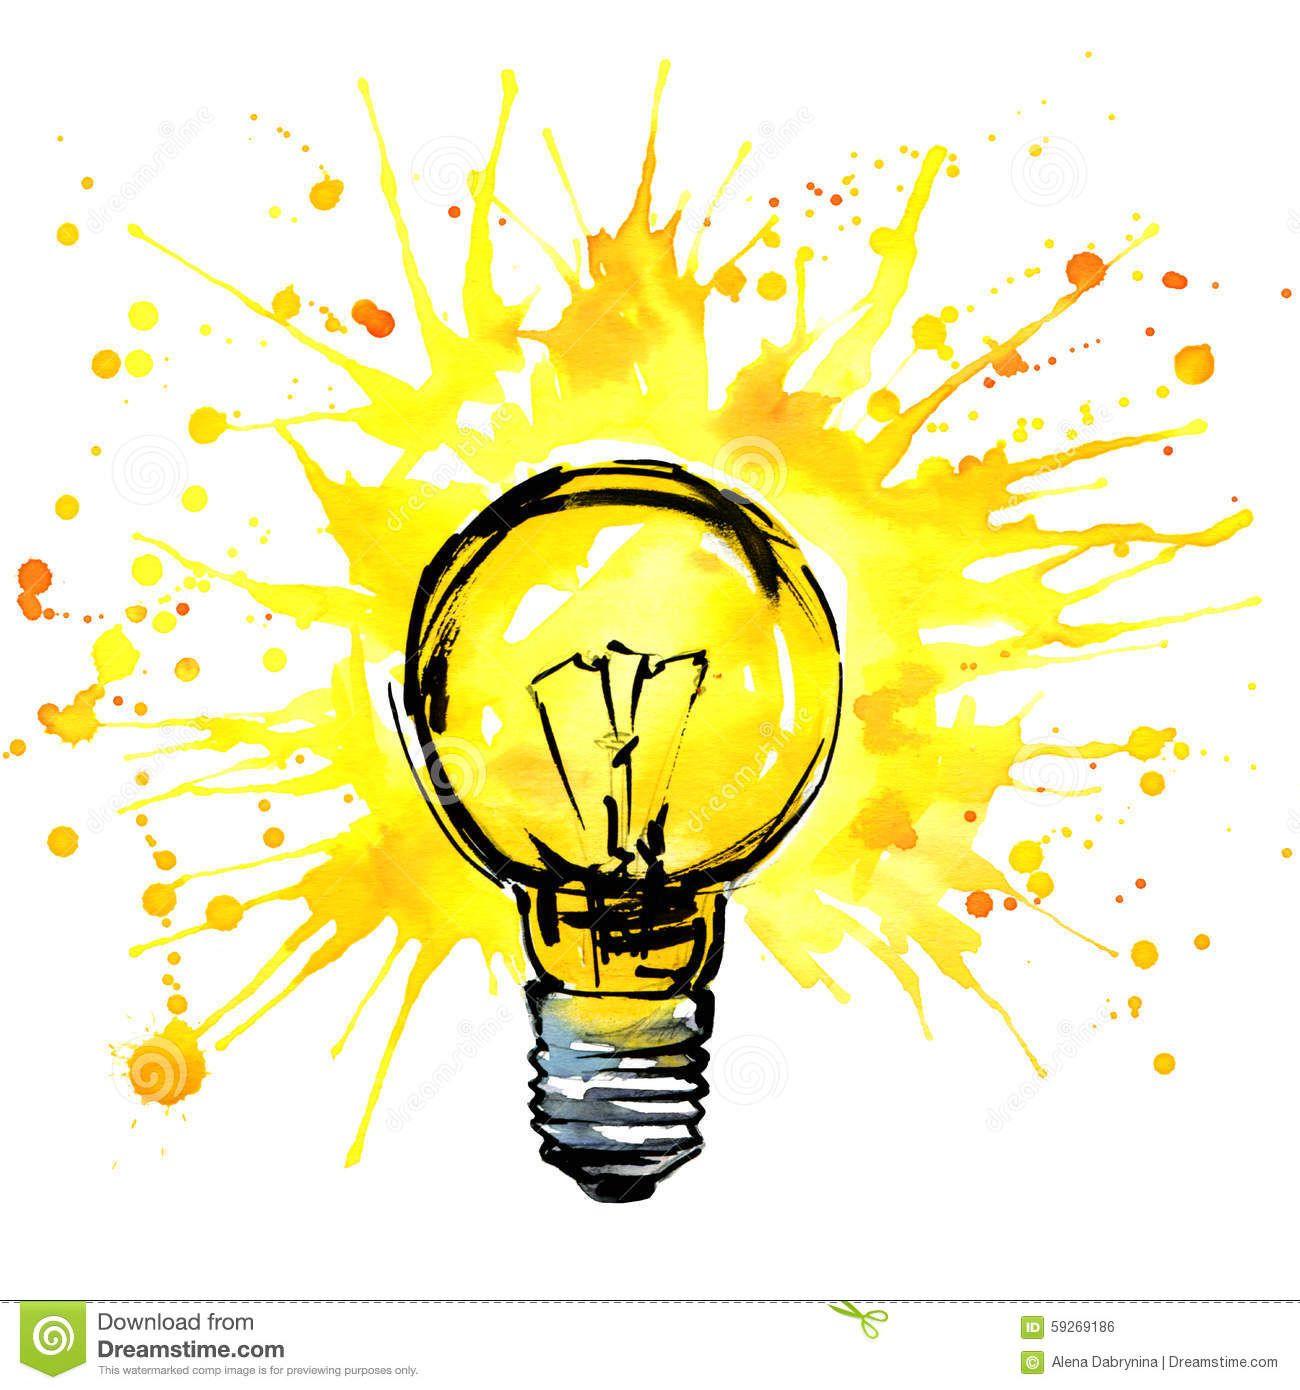 Http Thumbs Dreamstime Com Z Lightbulb Idea Concept Watercolor Illustration Hand Drawn Sign Splash Text Light Bulb Drawing Watercolor Illustration Light Bulb